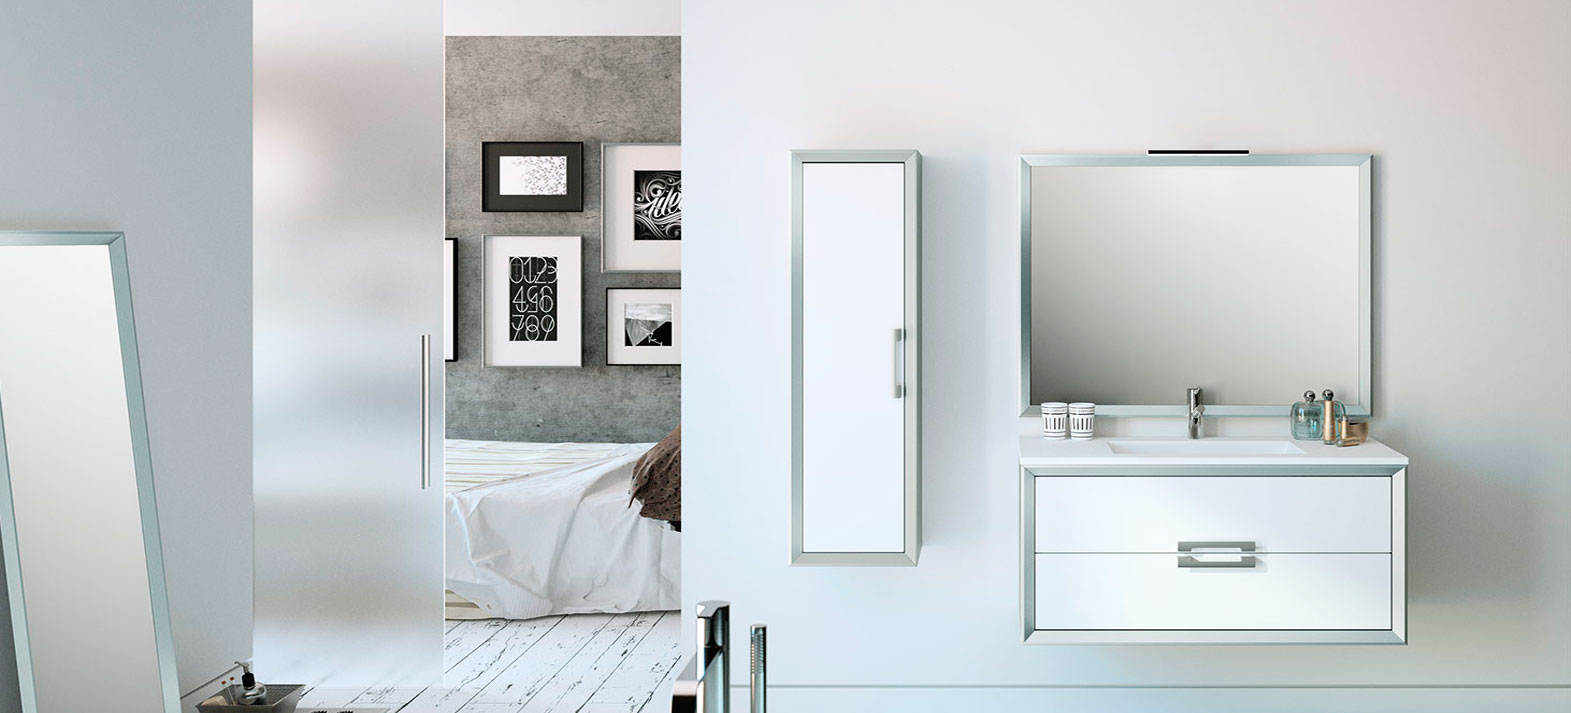 decor-tirador visobath mueble de baño